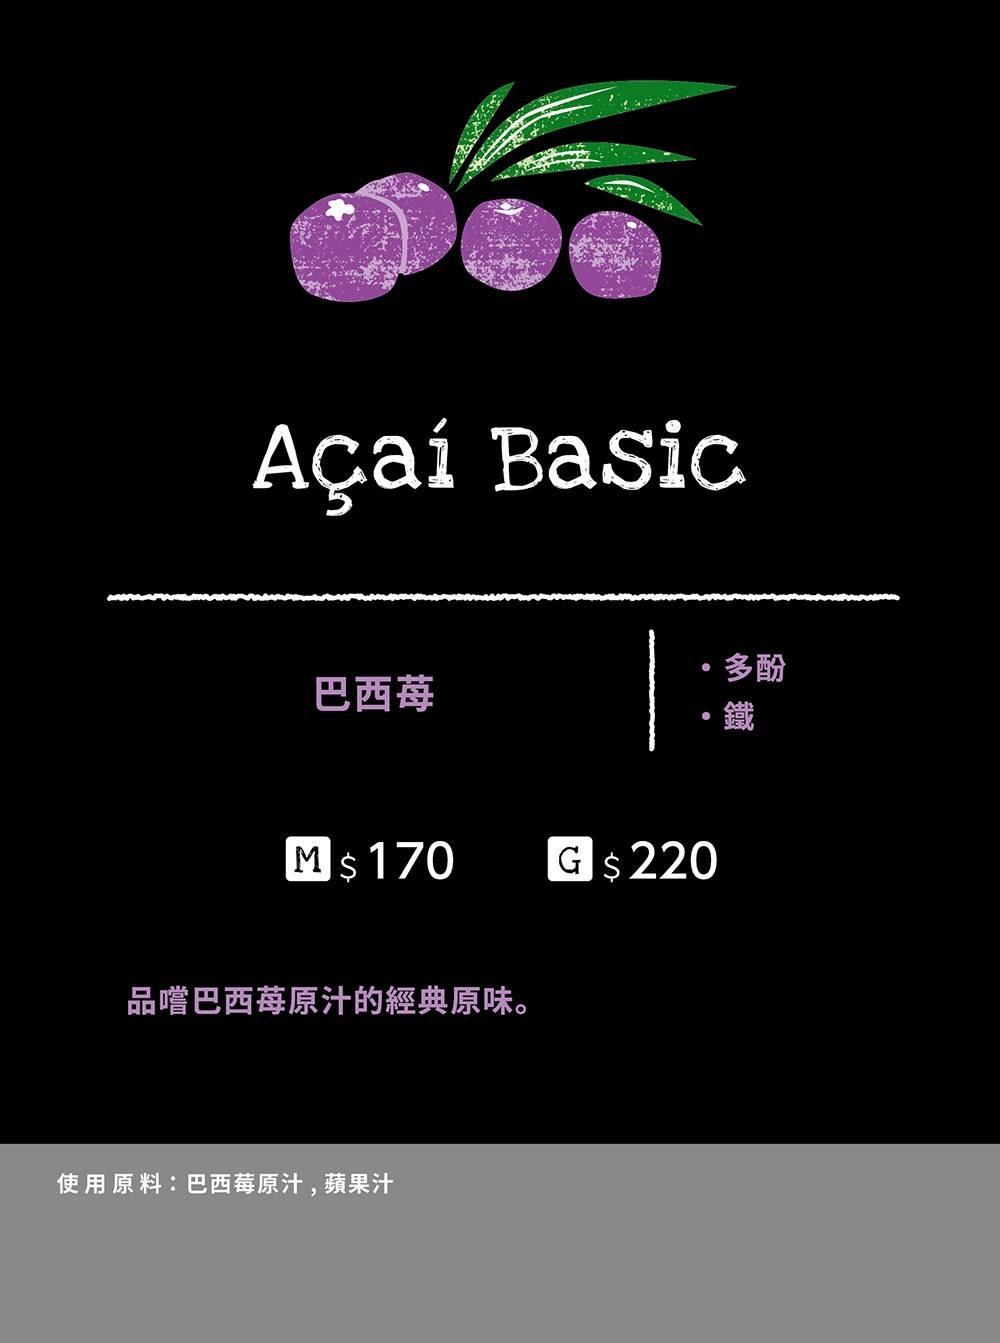 FRUTA FRUTA Acai Cafe l Taipei Cafe l A